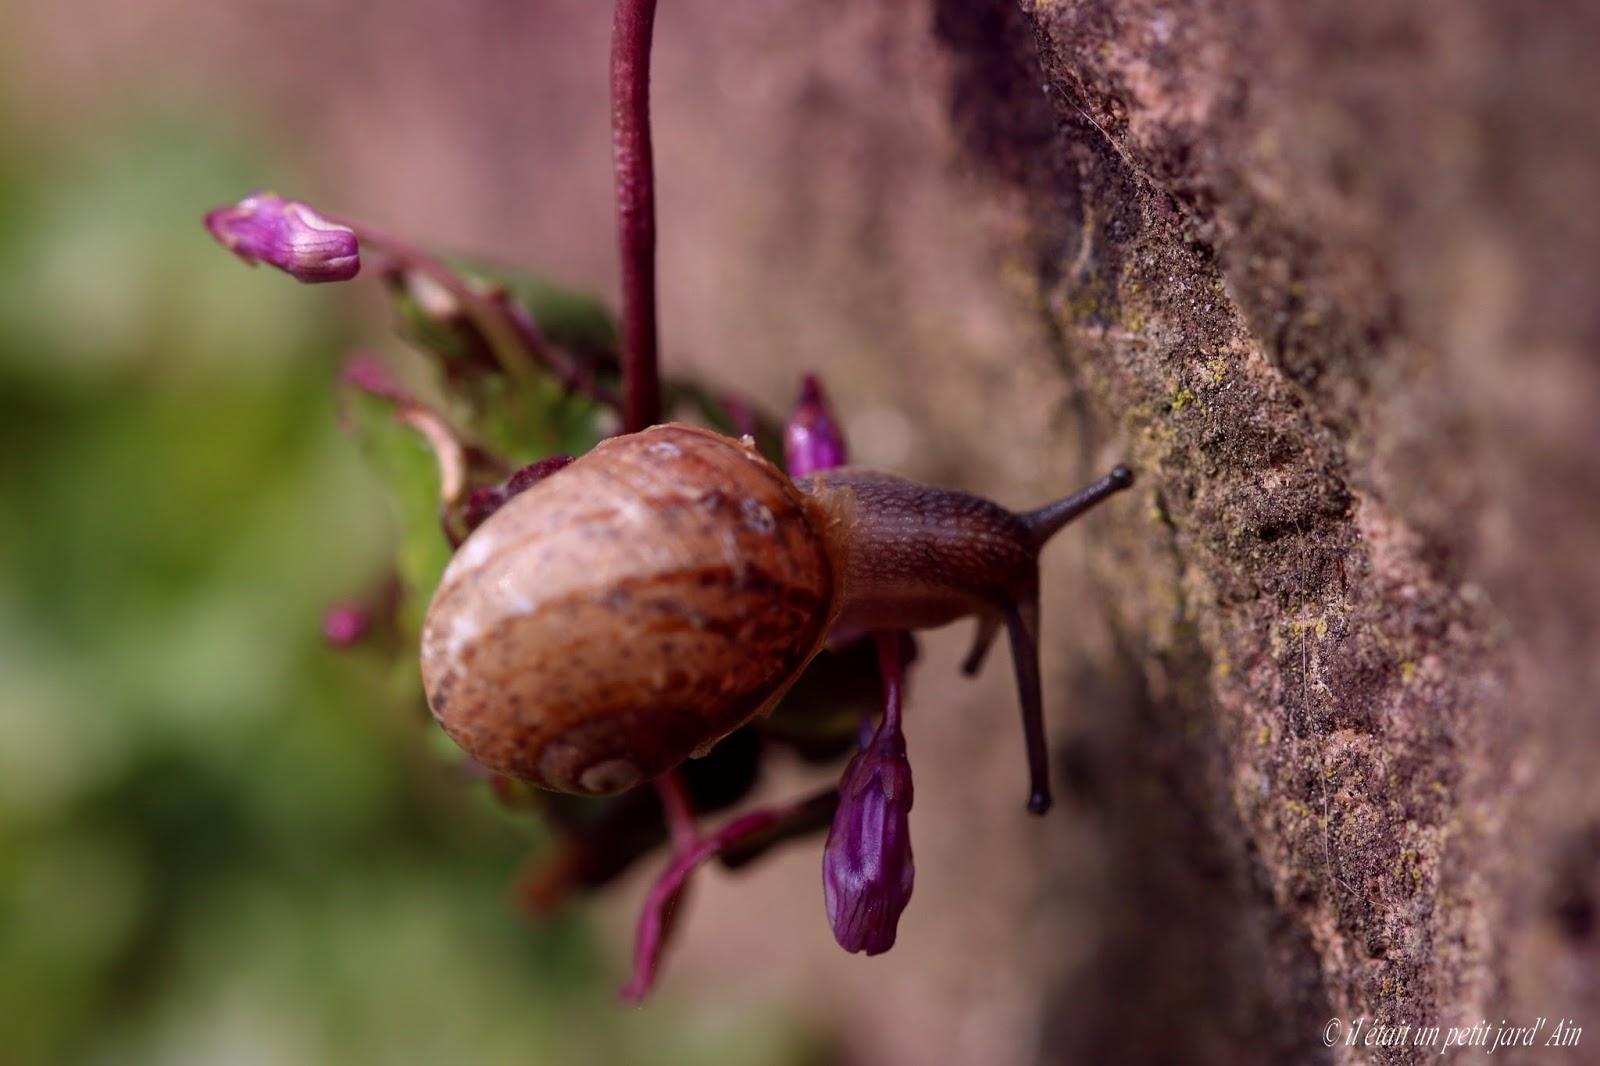 Petit escargot baveux 2 - 1 8